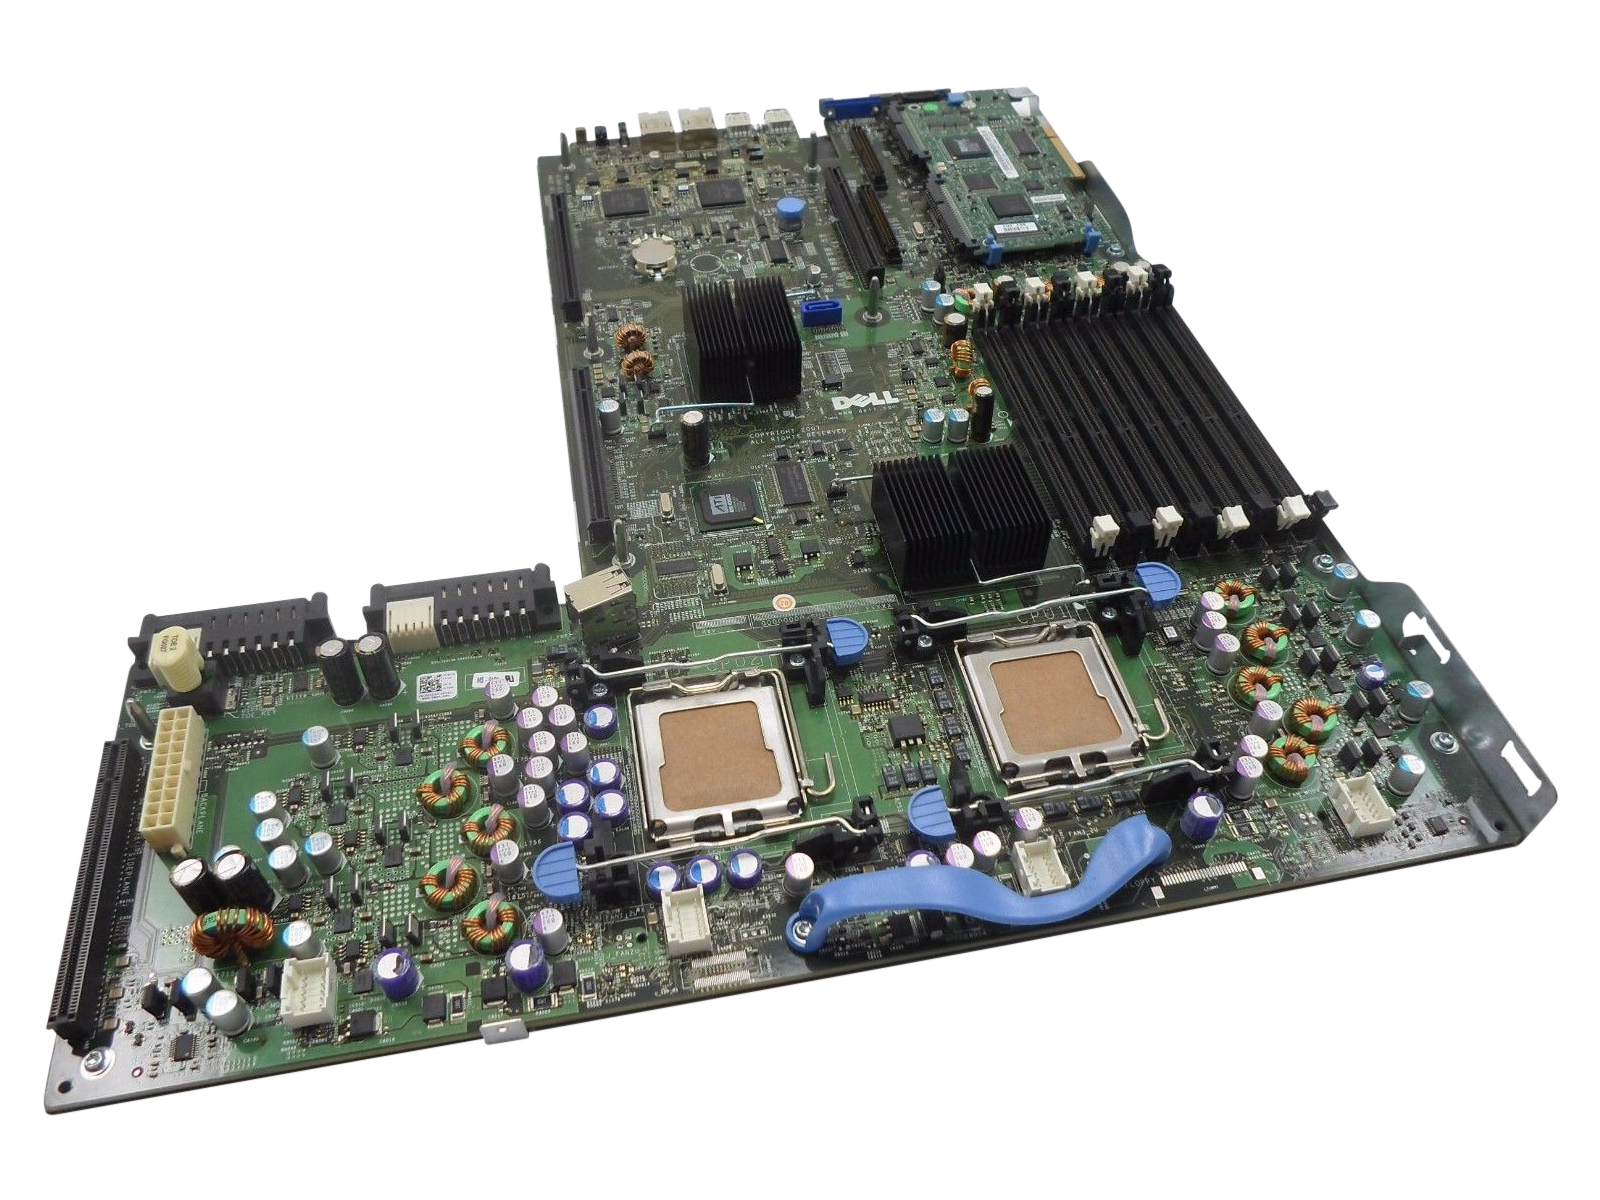 Dell Pe1950 Iii Oem System Board 1333Mhz